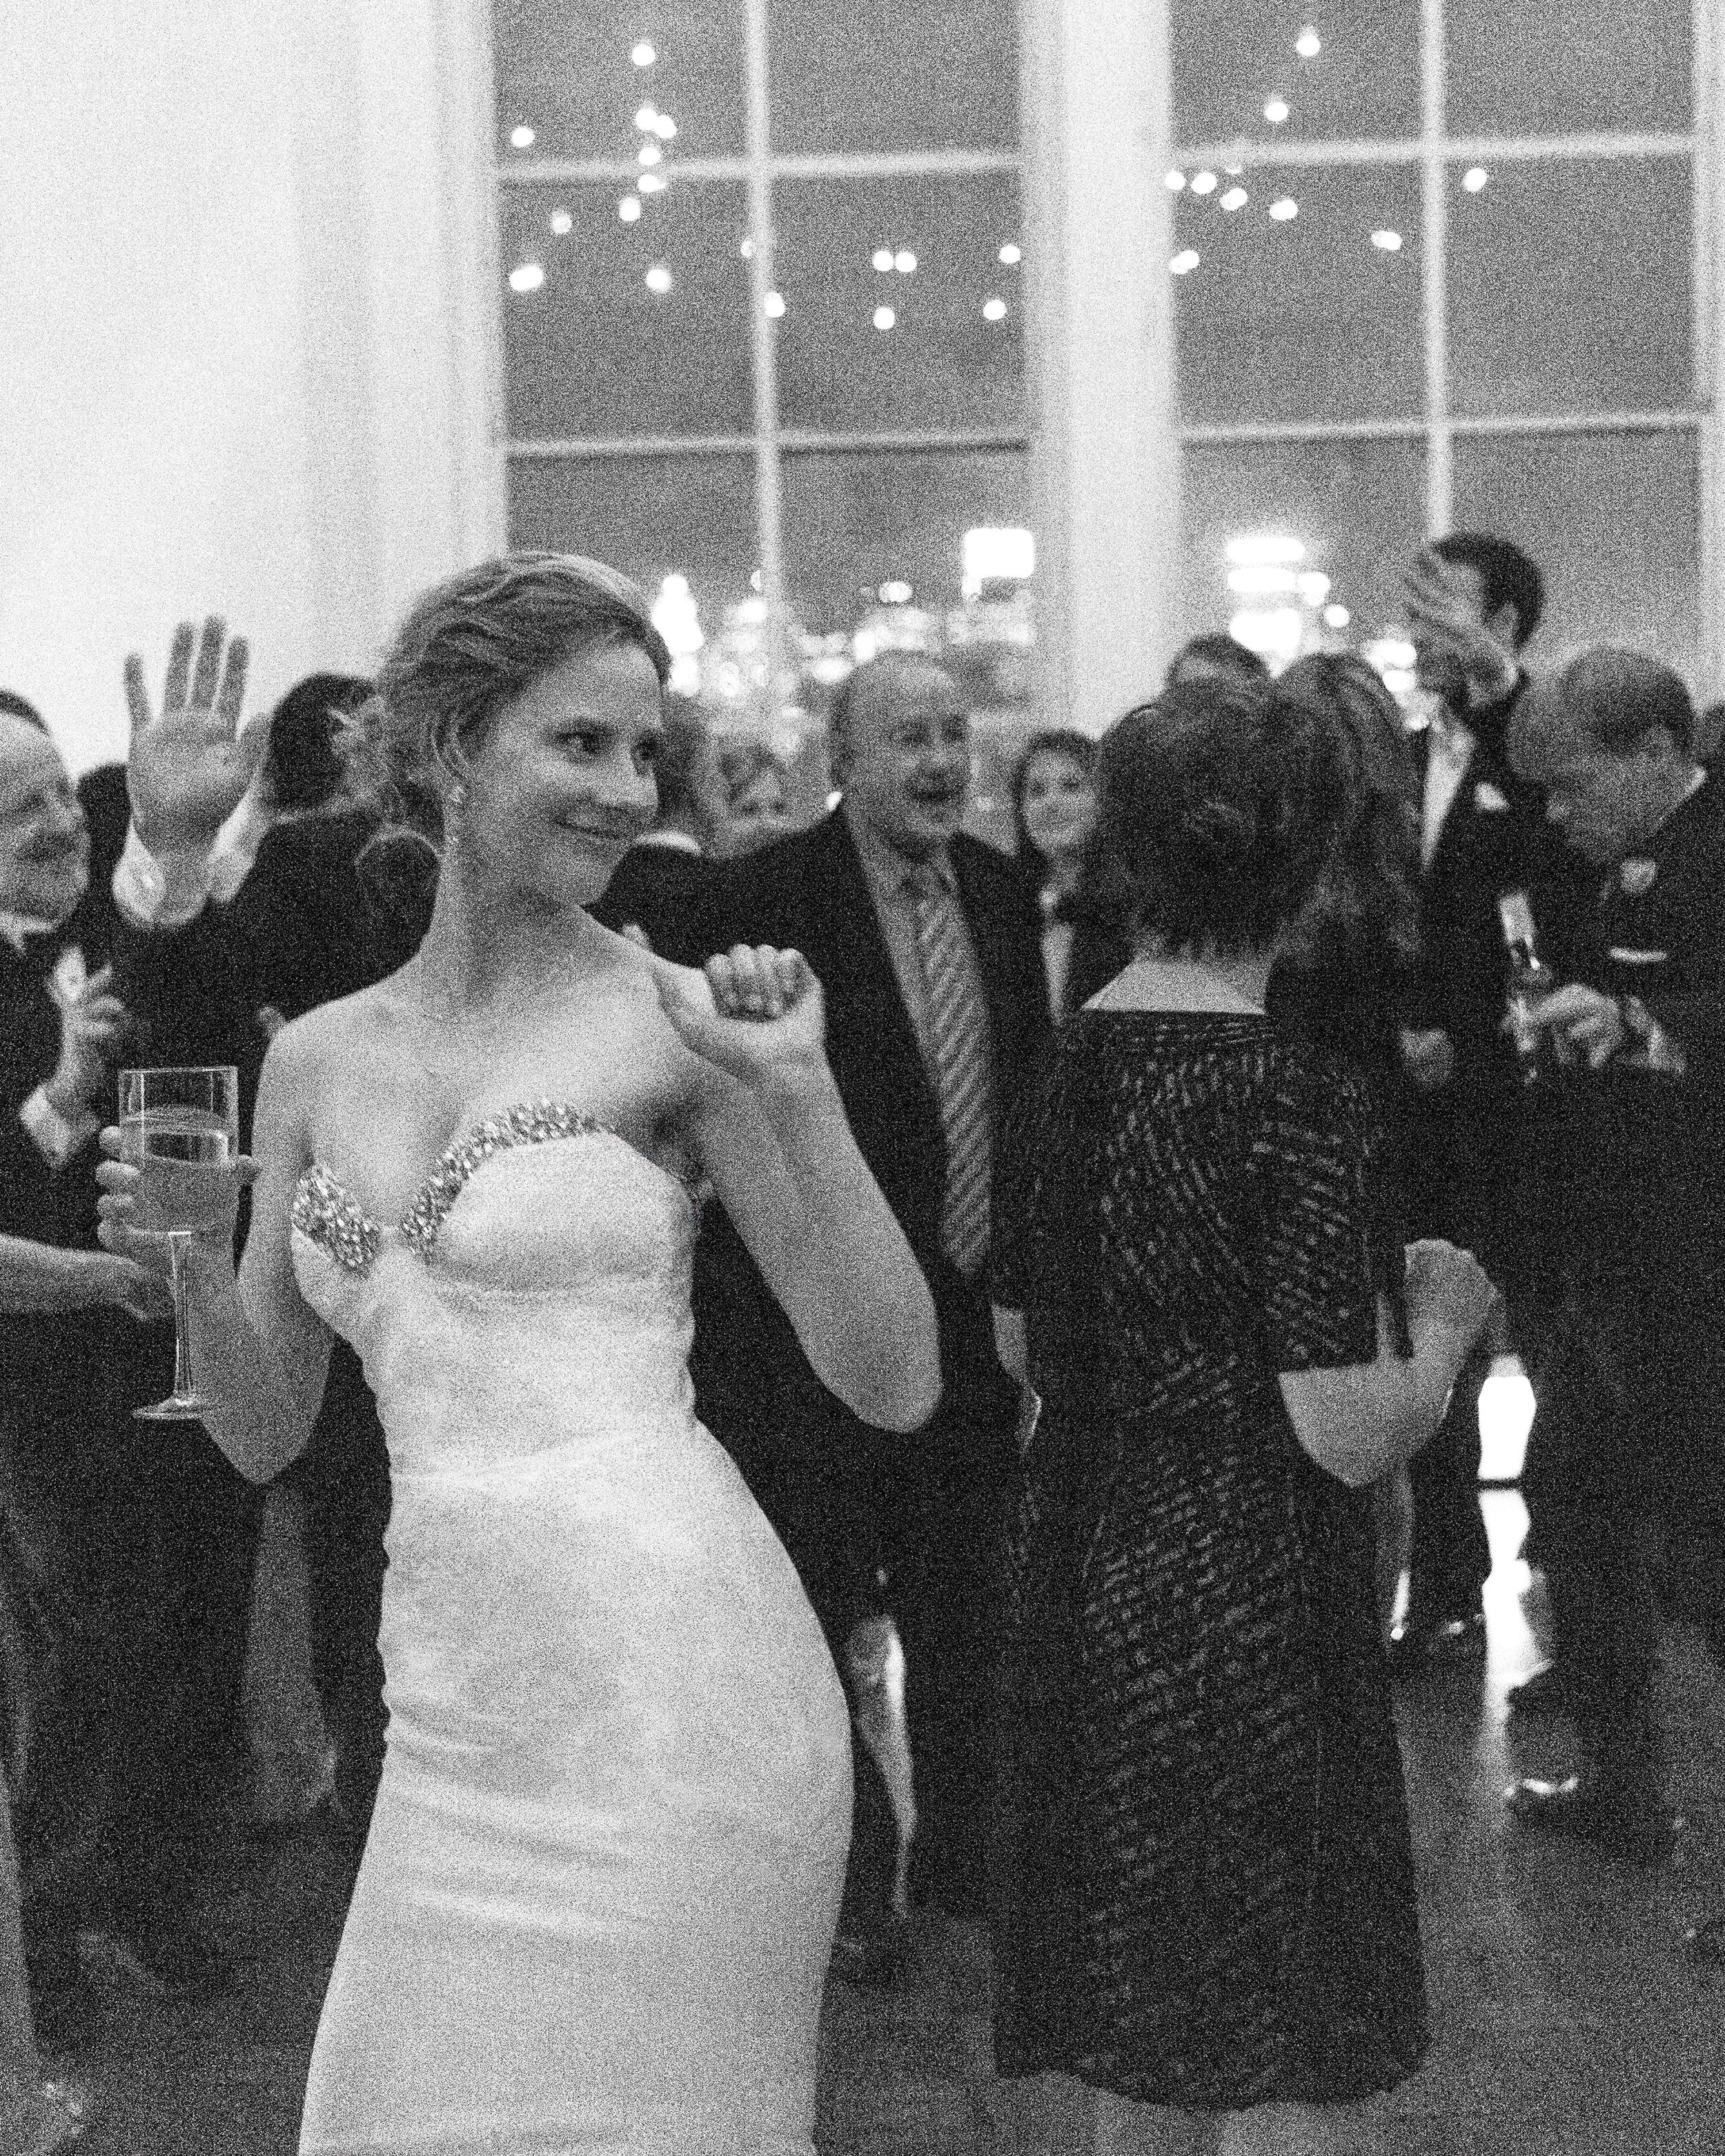 bride-dancing-bw-blake-chris-nyc-pi-5997-mwd110141.jpg